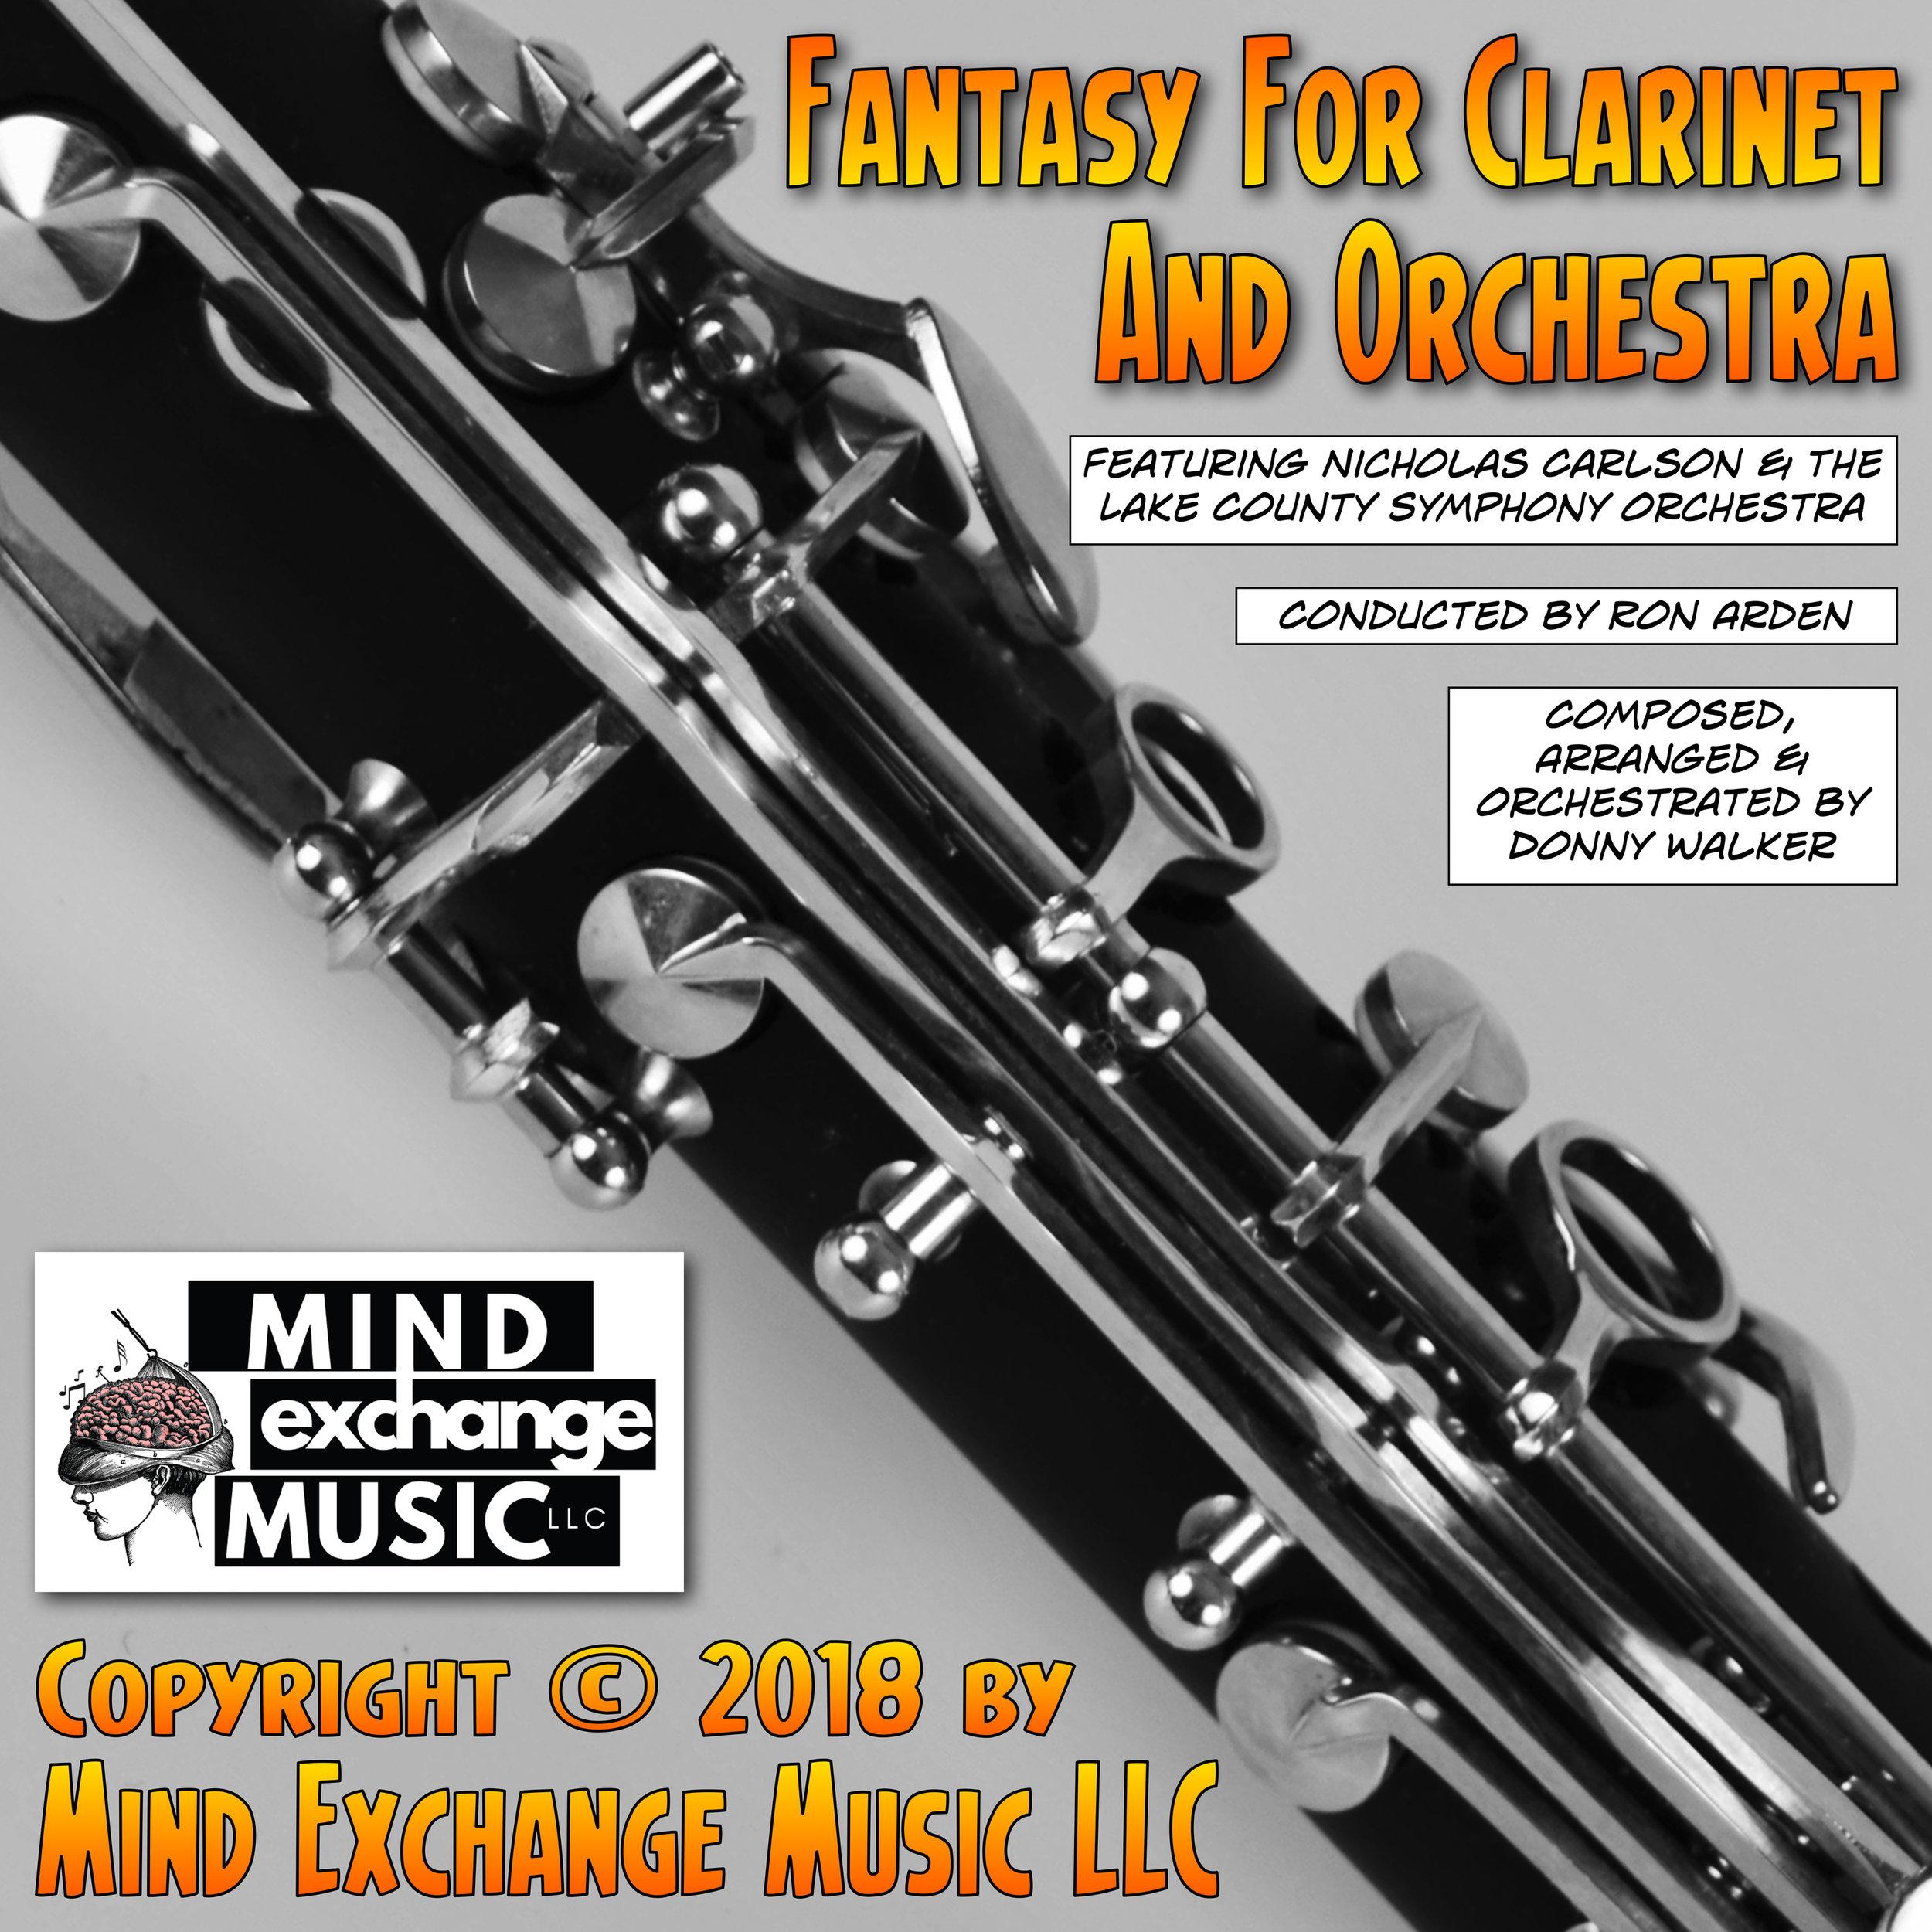 Fantasy For Clarinet & Orchestra - Album Artwork copy.jpg